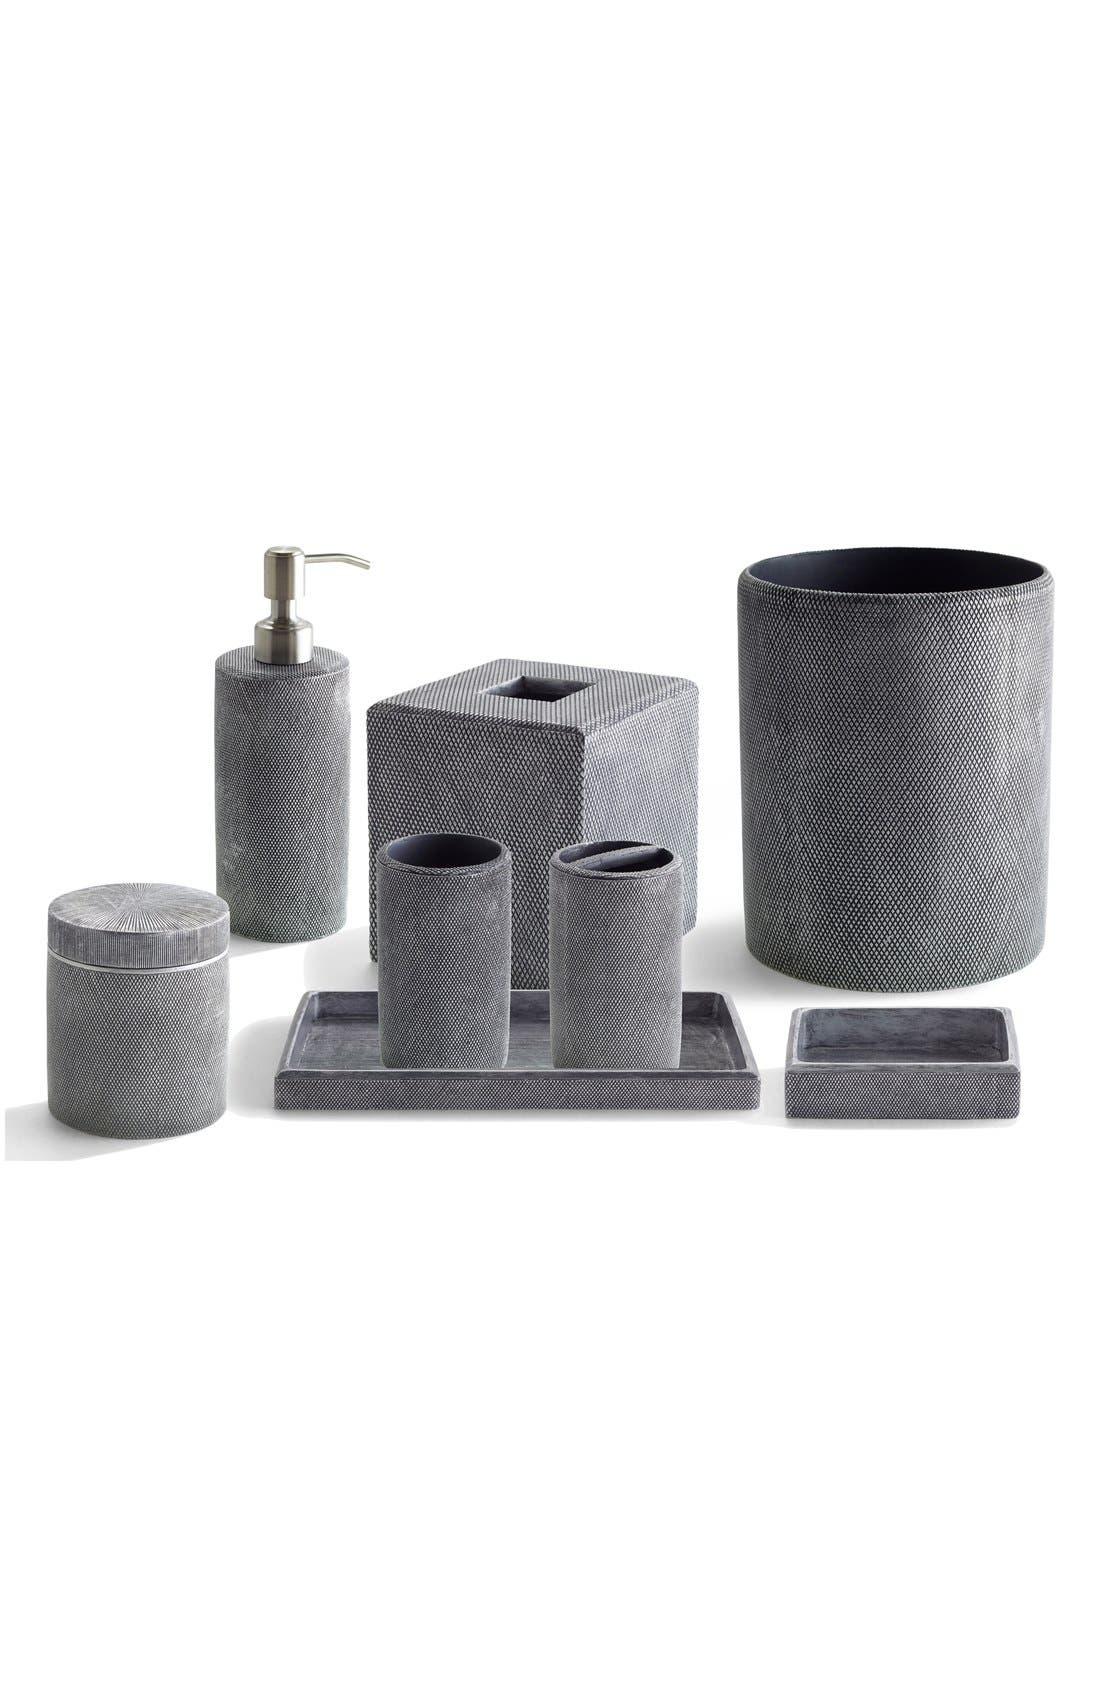 Etched Lotion Dispenser,                             Alternate thumbnail 2, color,                             Grey